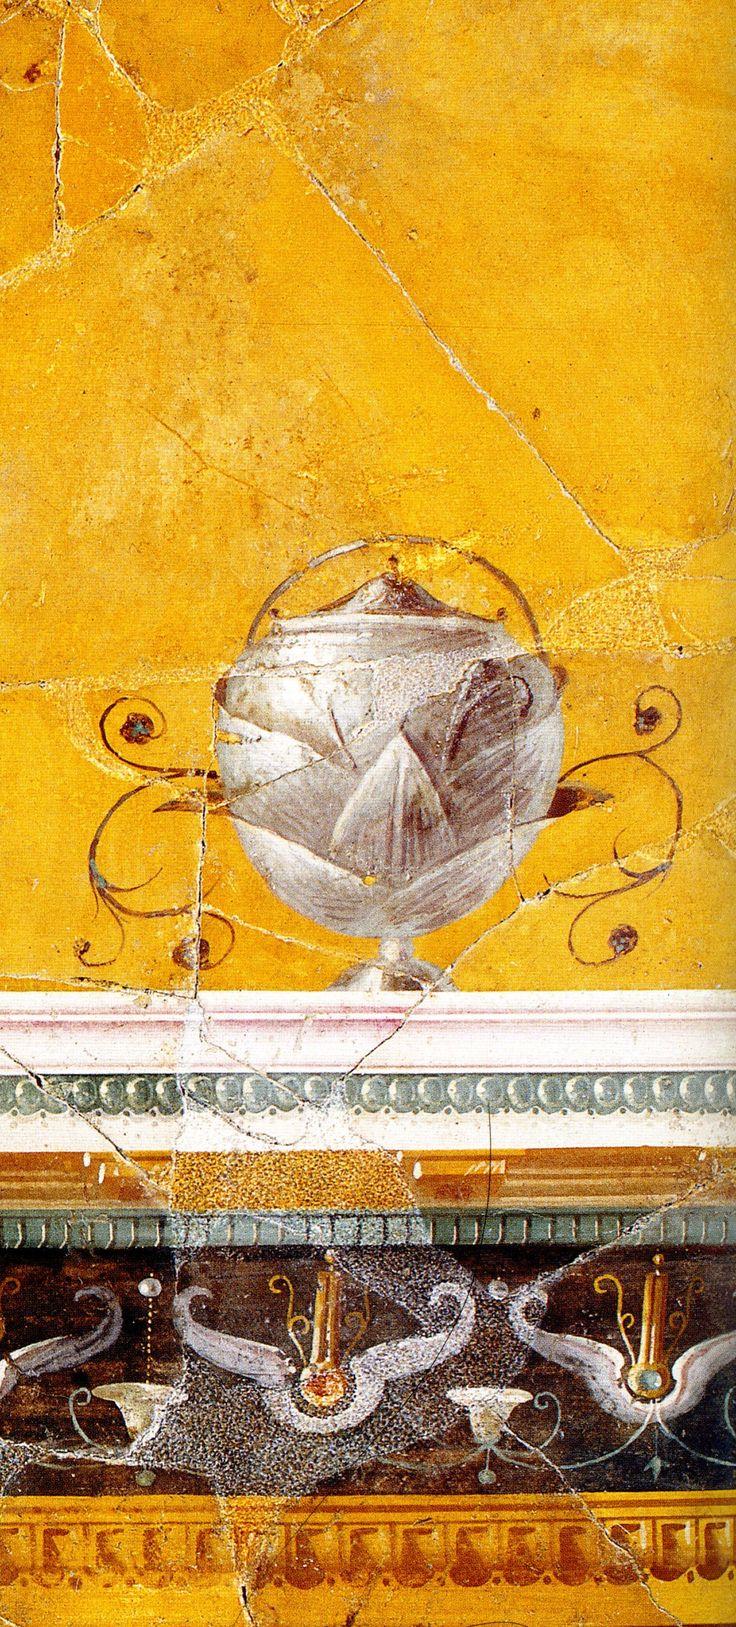 1265 best Painted rooms images on Pinterest | Jean cocteau, Murals ...